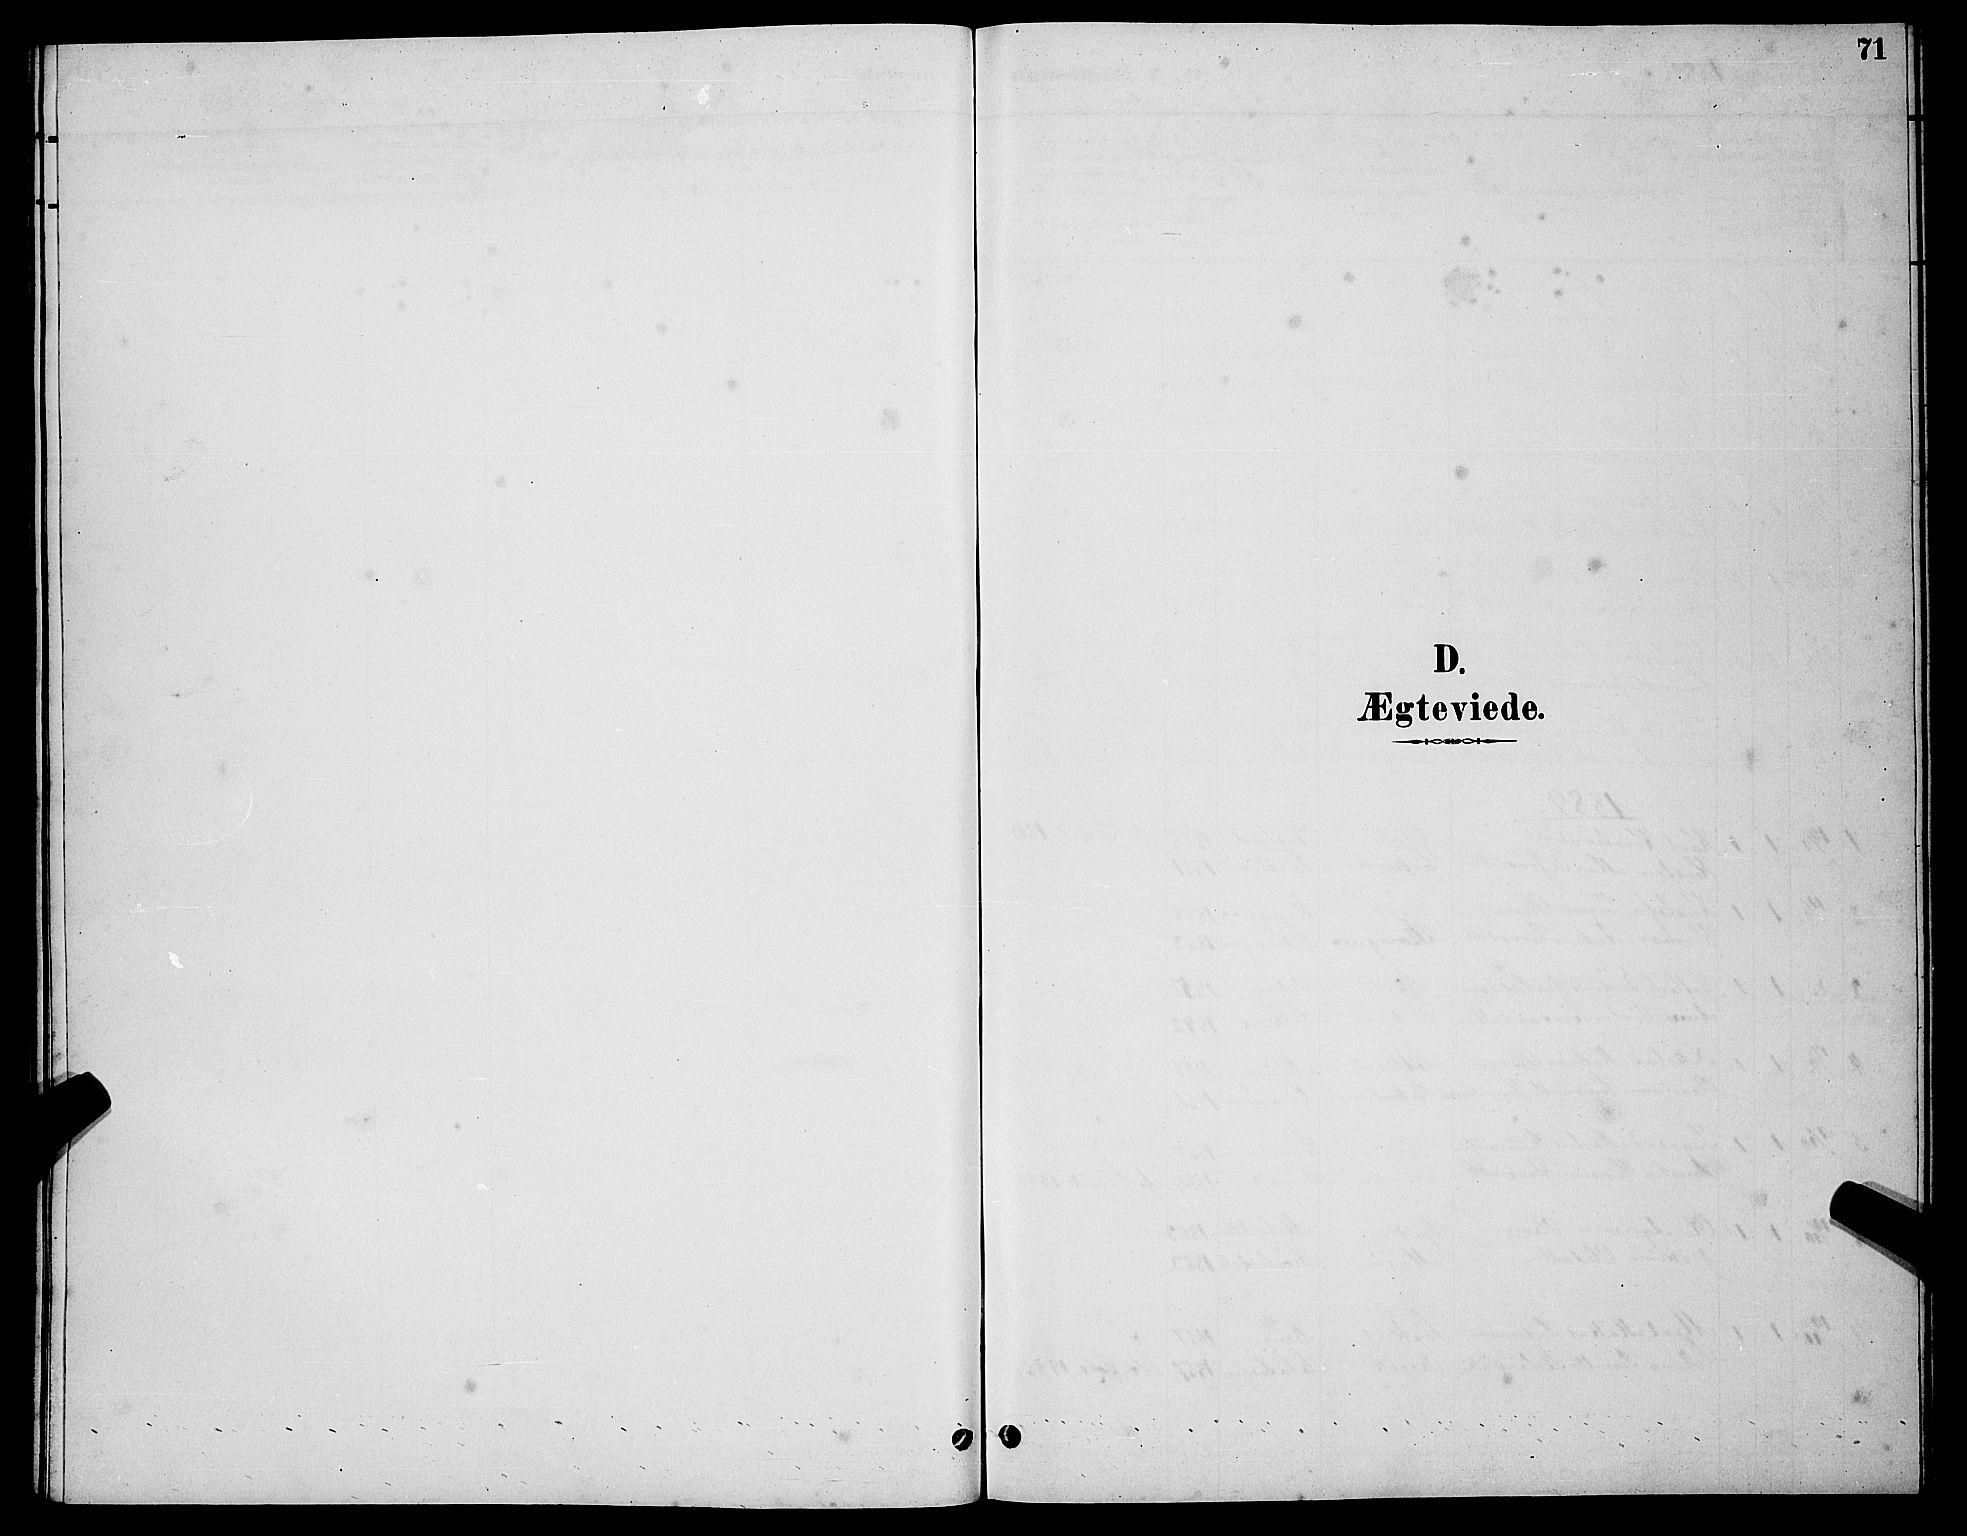 SATØ, Tranøy sokneprestkontor, I/Ia/Iab/L0004klokker: Klokkerbok nr. 4, 1888-1901, s. 71